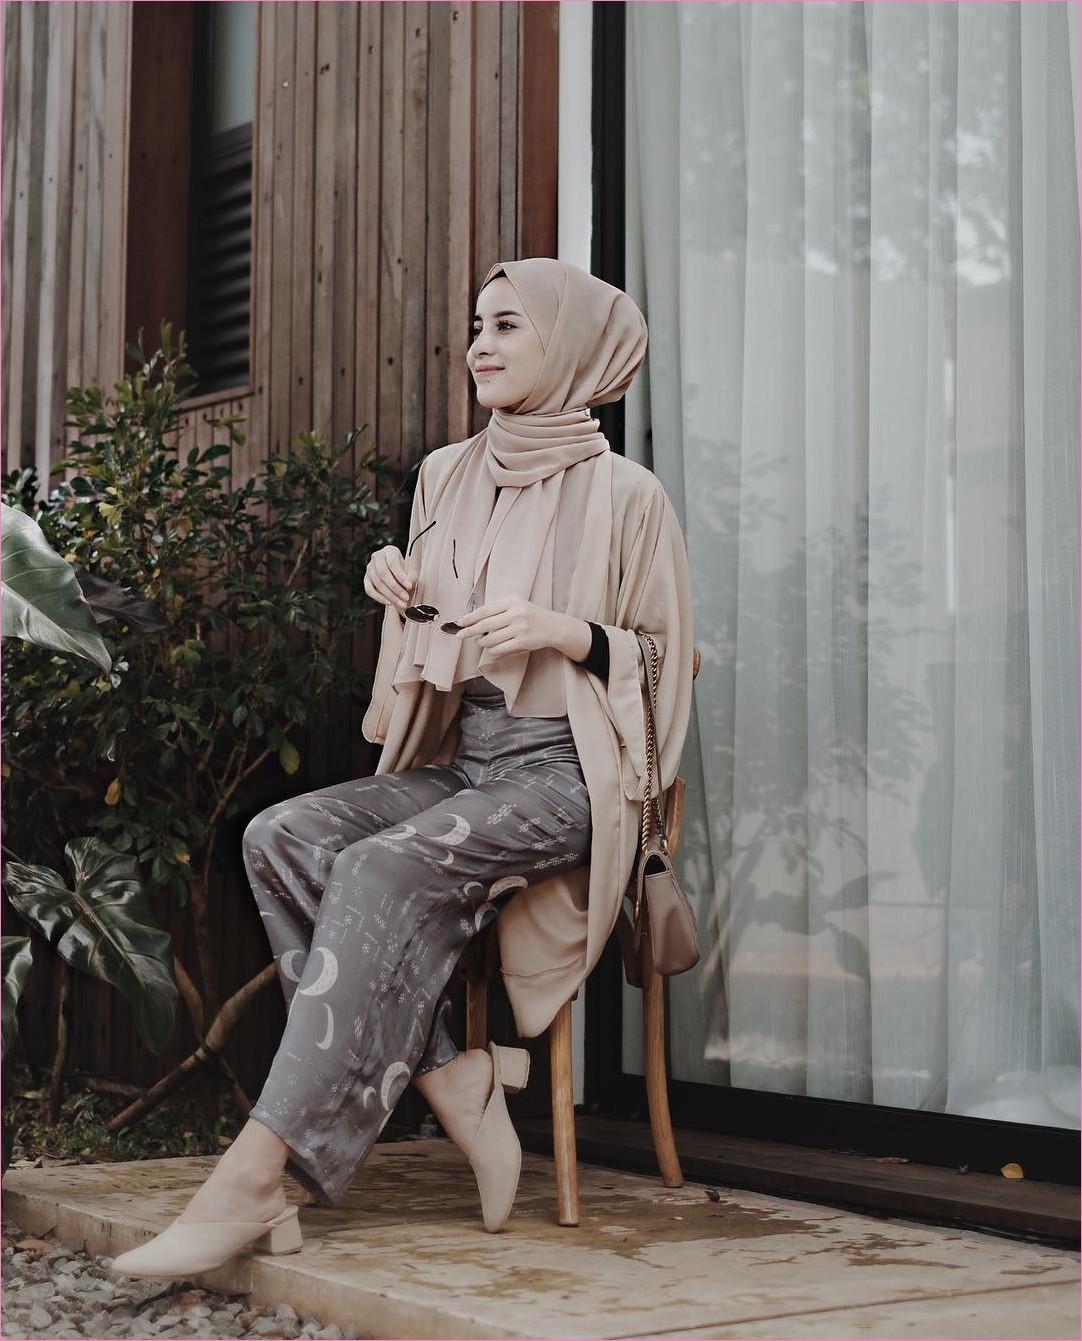 Outfit Kerudung Pashmina Ala Selebgram 2018 hijab pashmina diamond ciput rajut outer blouse high heels loafers and slip ons krem mangset hitam celana kulot pallazo coklat kacamata bulat ootd hijabers kekinian trendy hotel